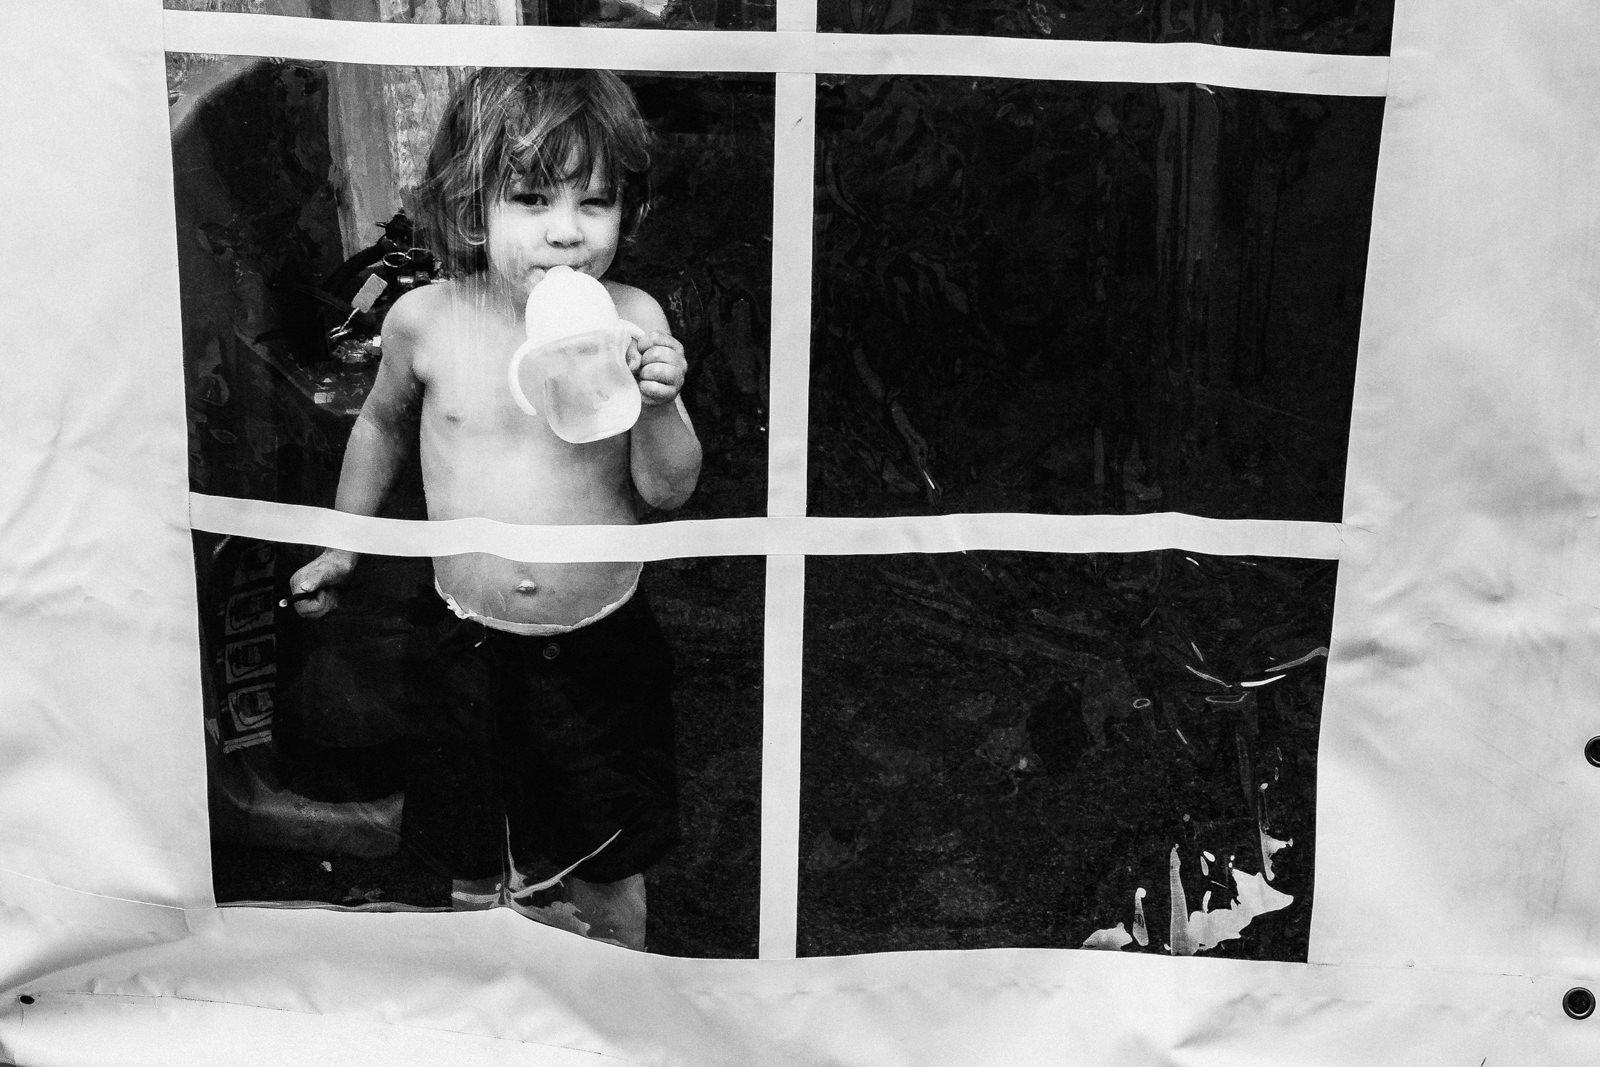 Kid peeping